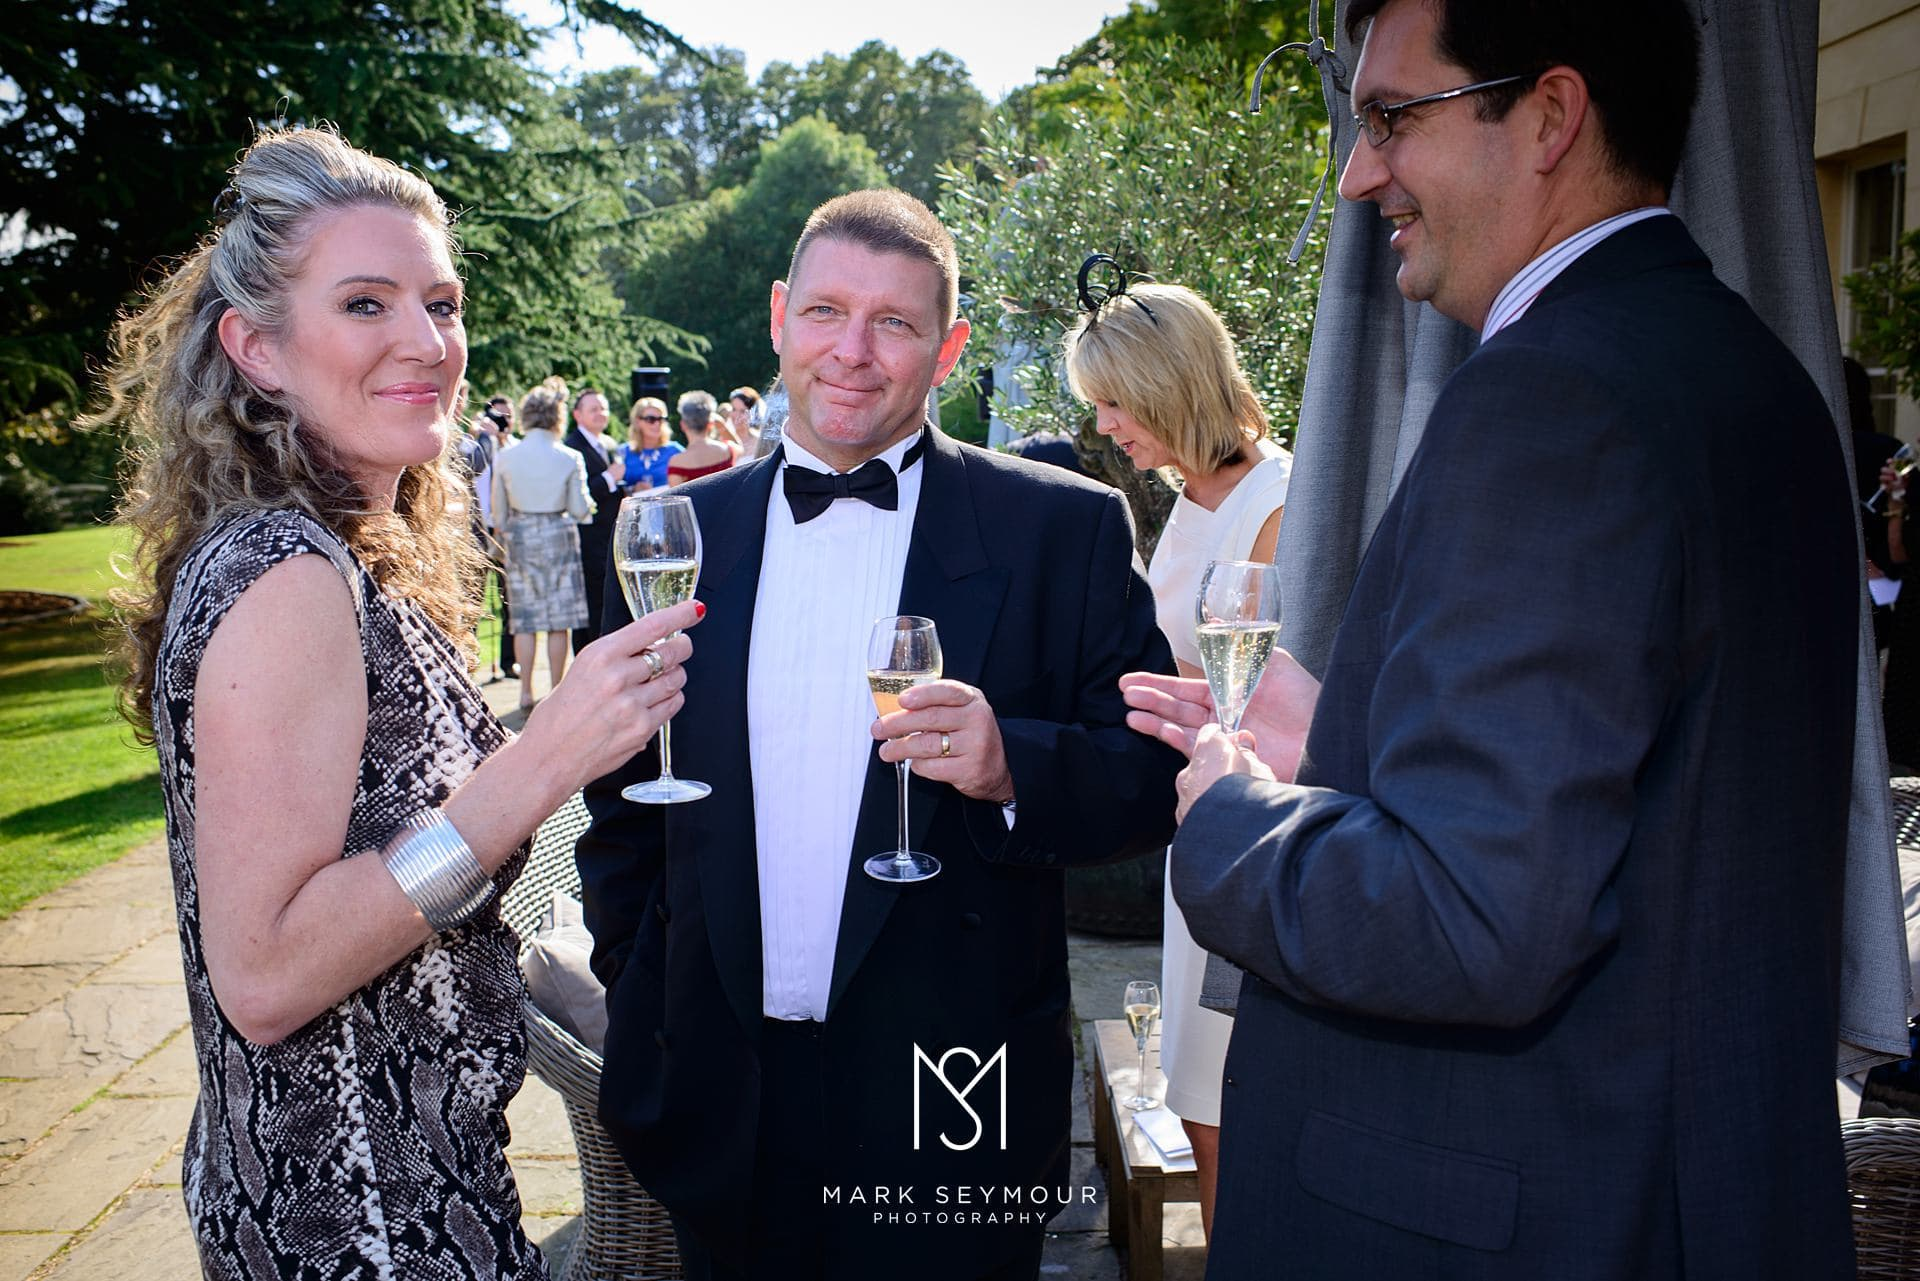 Wedding reception at The Limewood Hotel